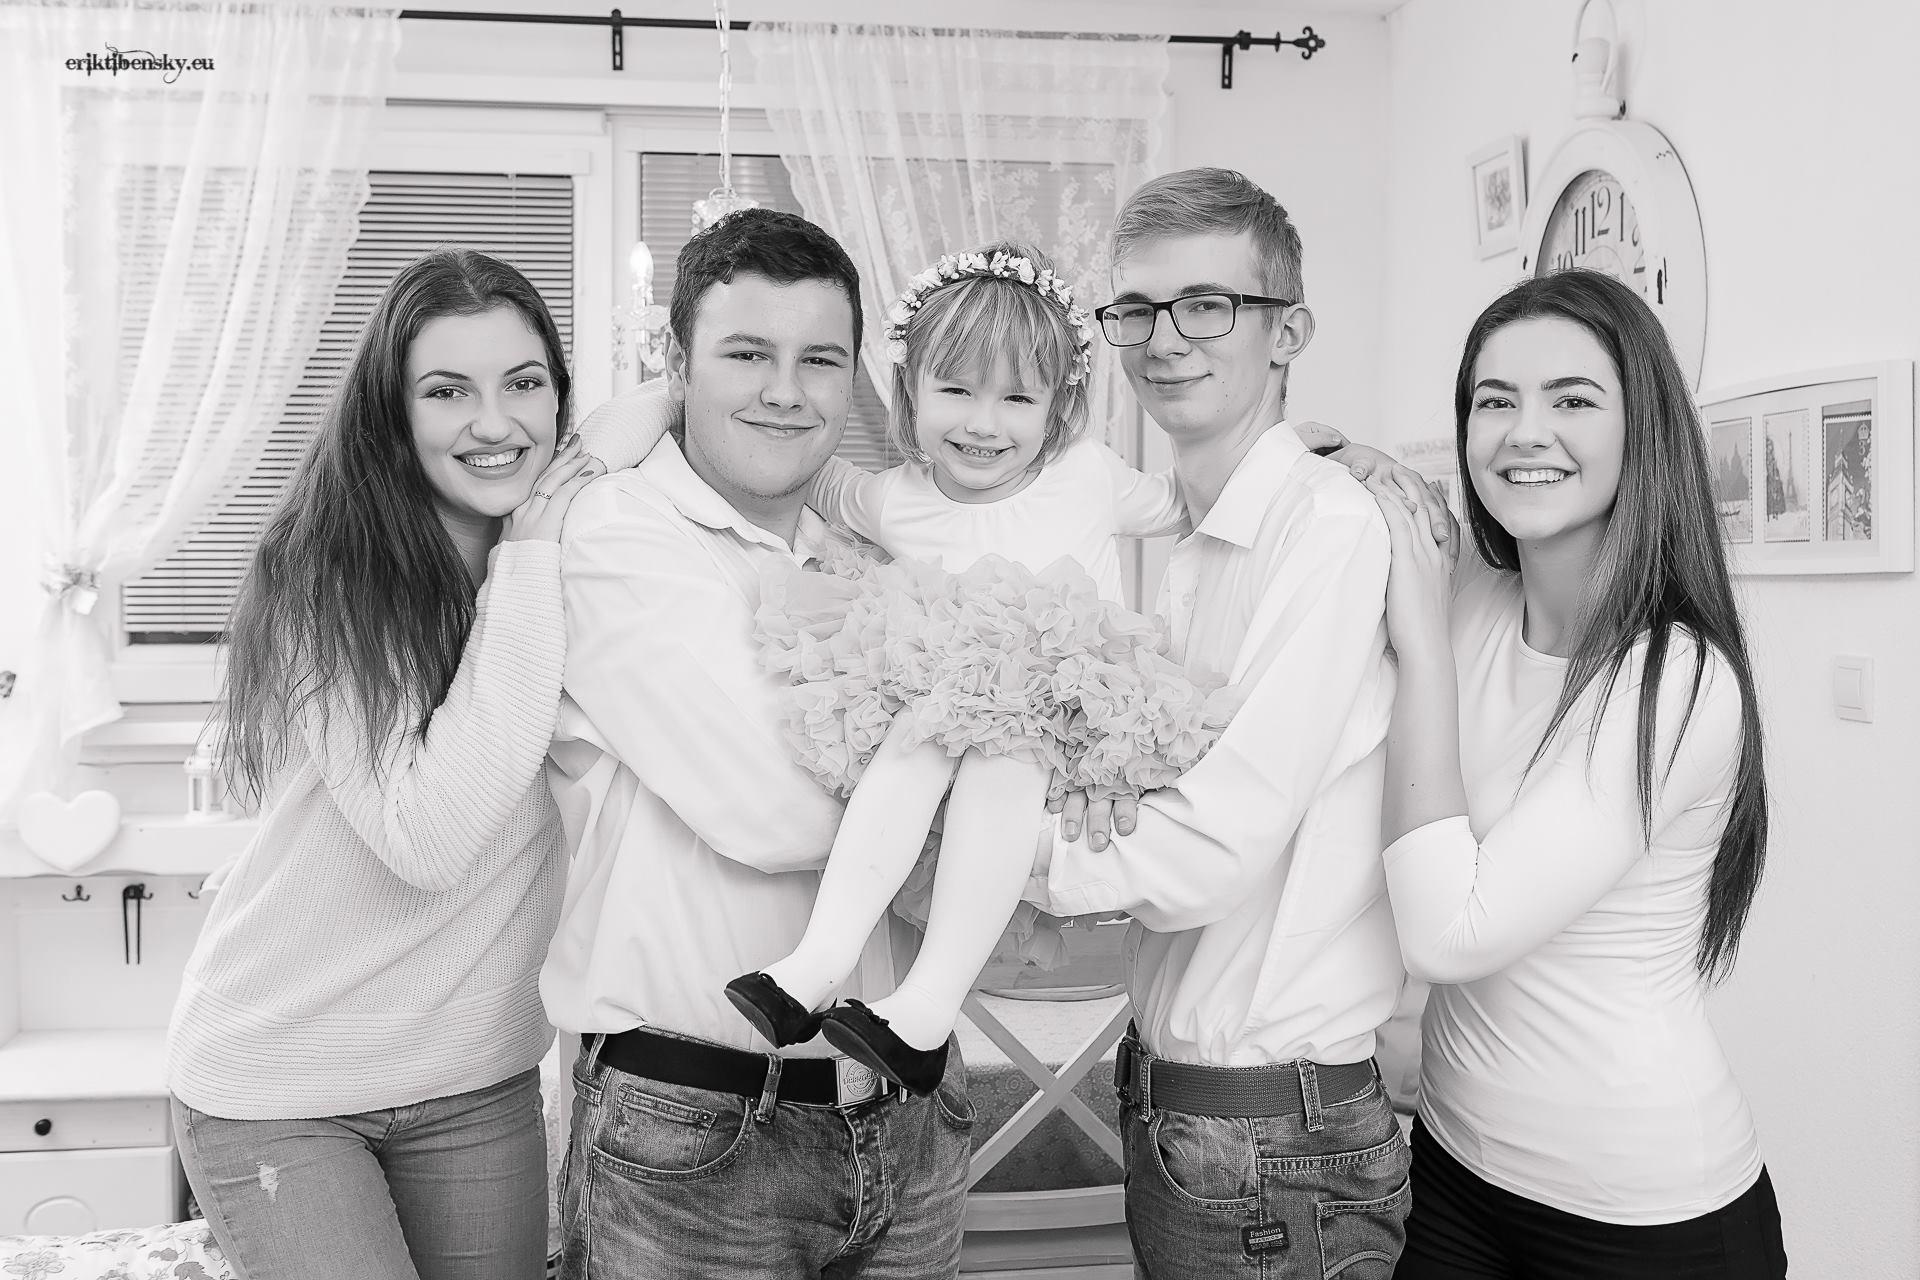 eriktibensky-eu-fotograf-home-photo-family-rodina-kids-deti-1006